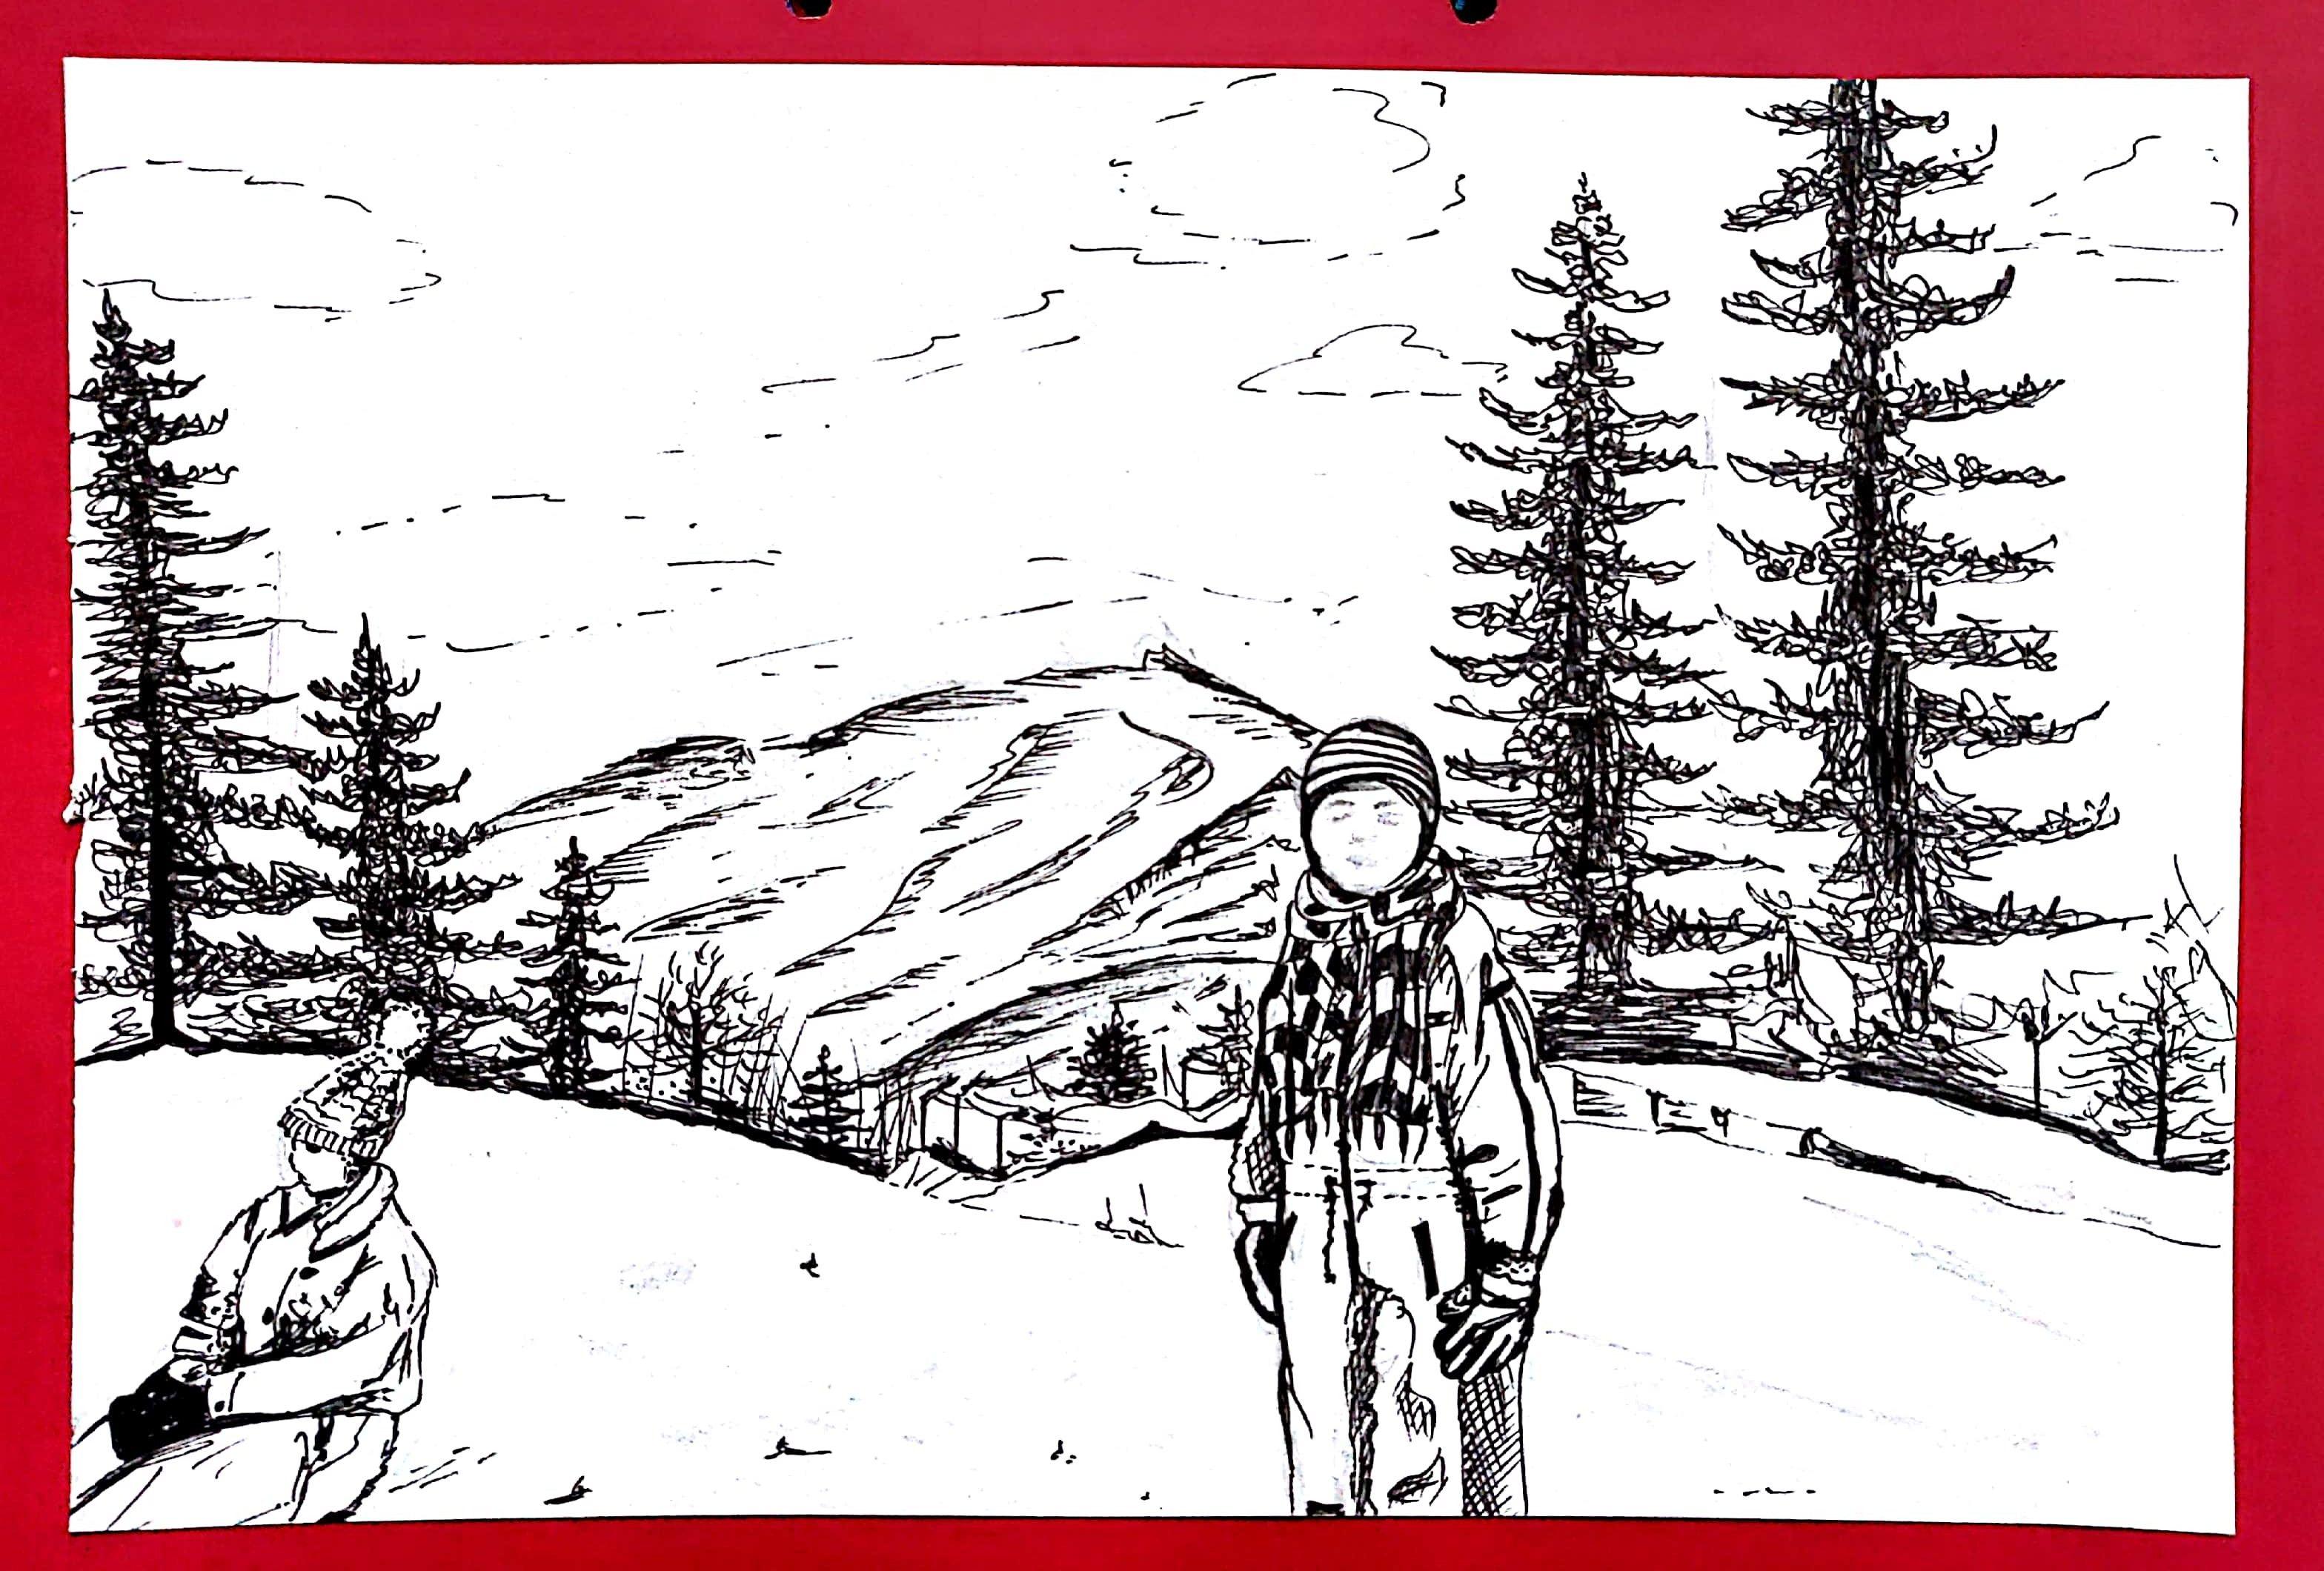 Kufri drawing hill architecture uzair sketching uzair